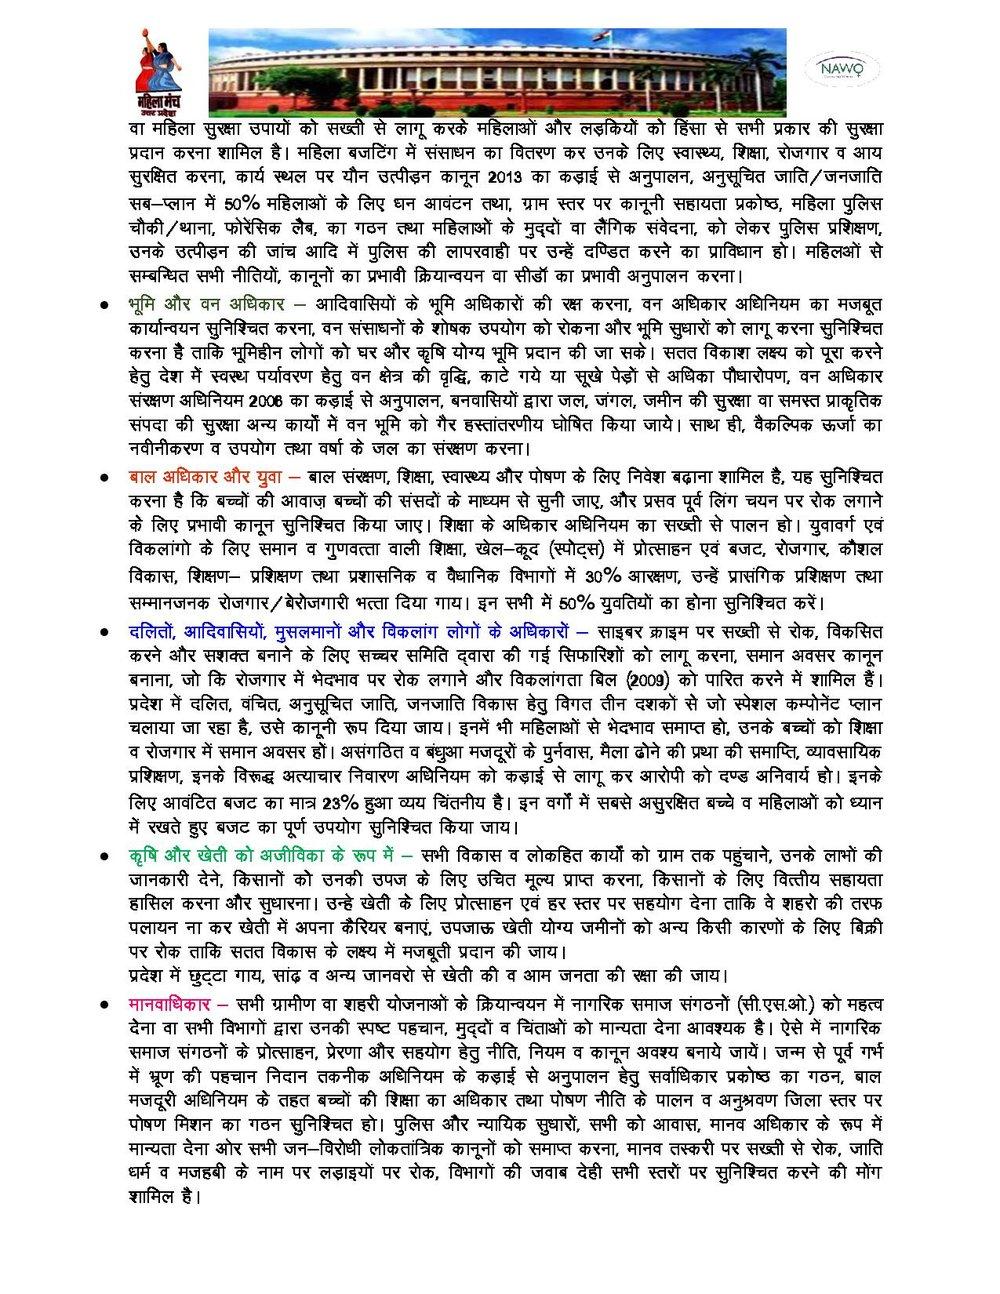 People Manifesto 2019 (Mahila Manch & NAWO) local issues.docx-page-003.jpg